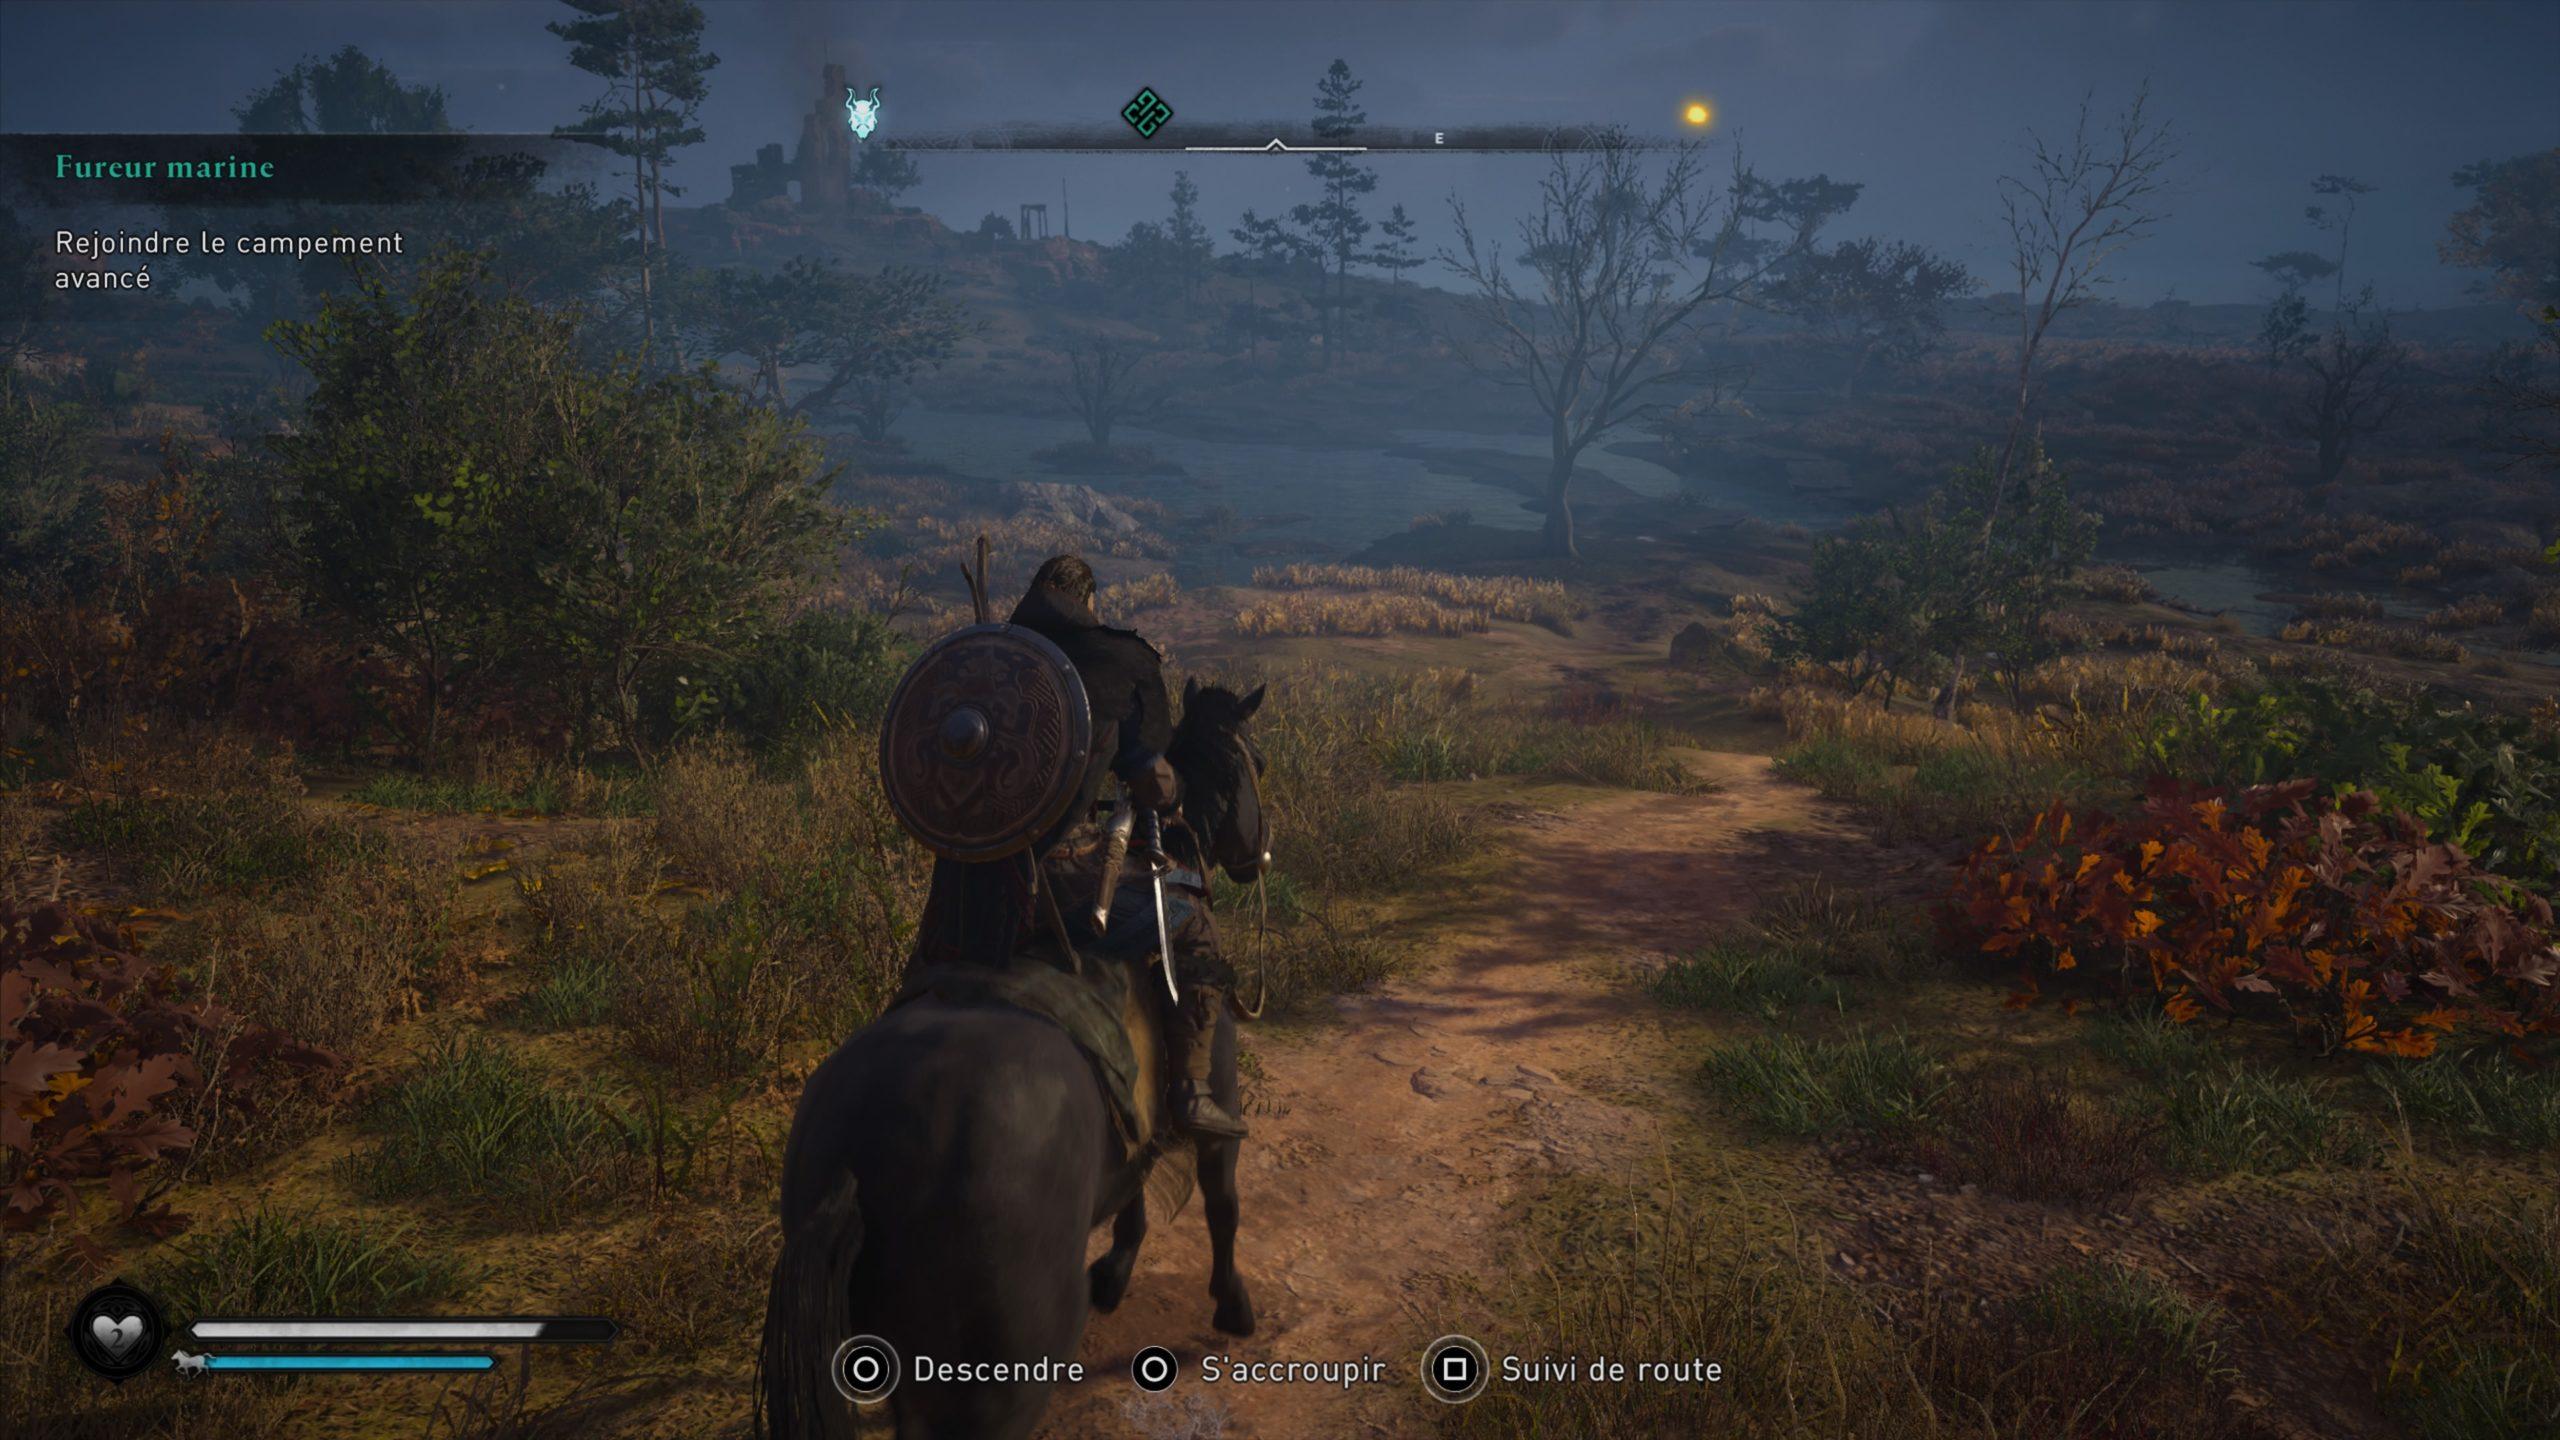 Test de jeu - Assassin's Creed Valhalla